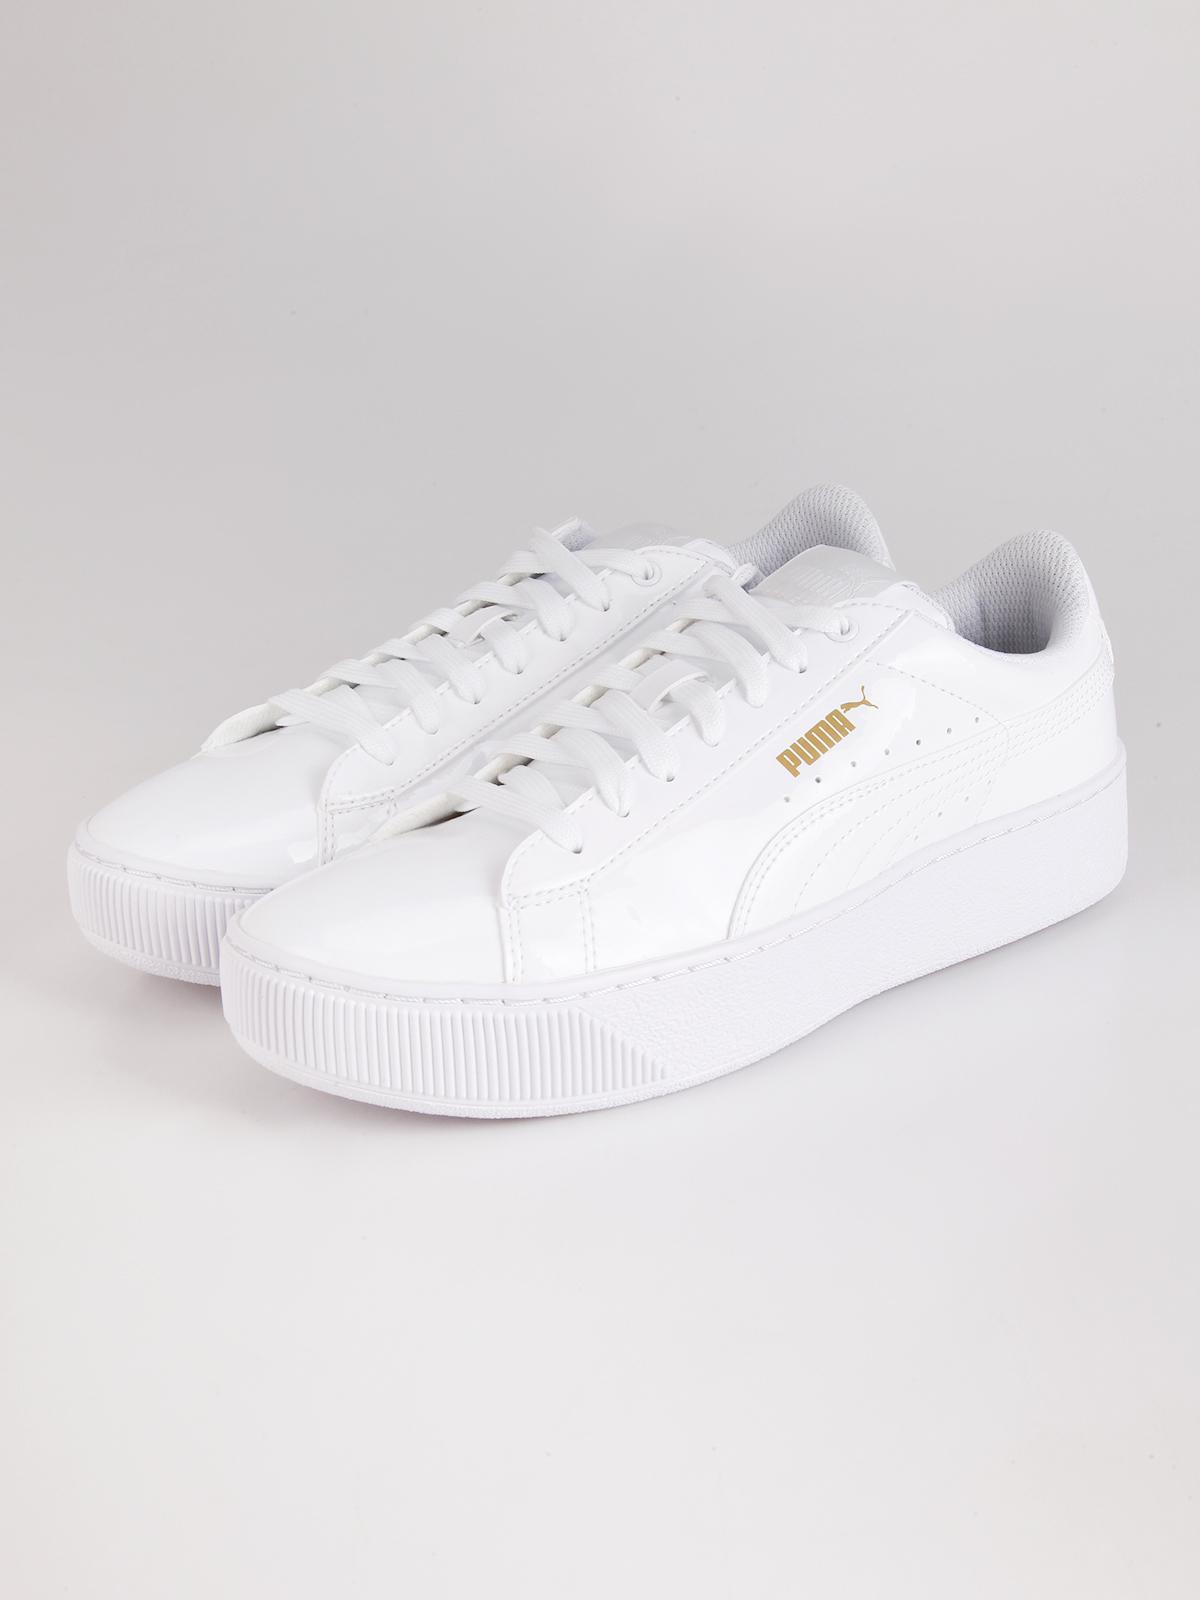 Scarpe casual Puma vikky platform patent Bianco puma